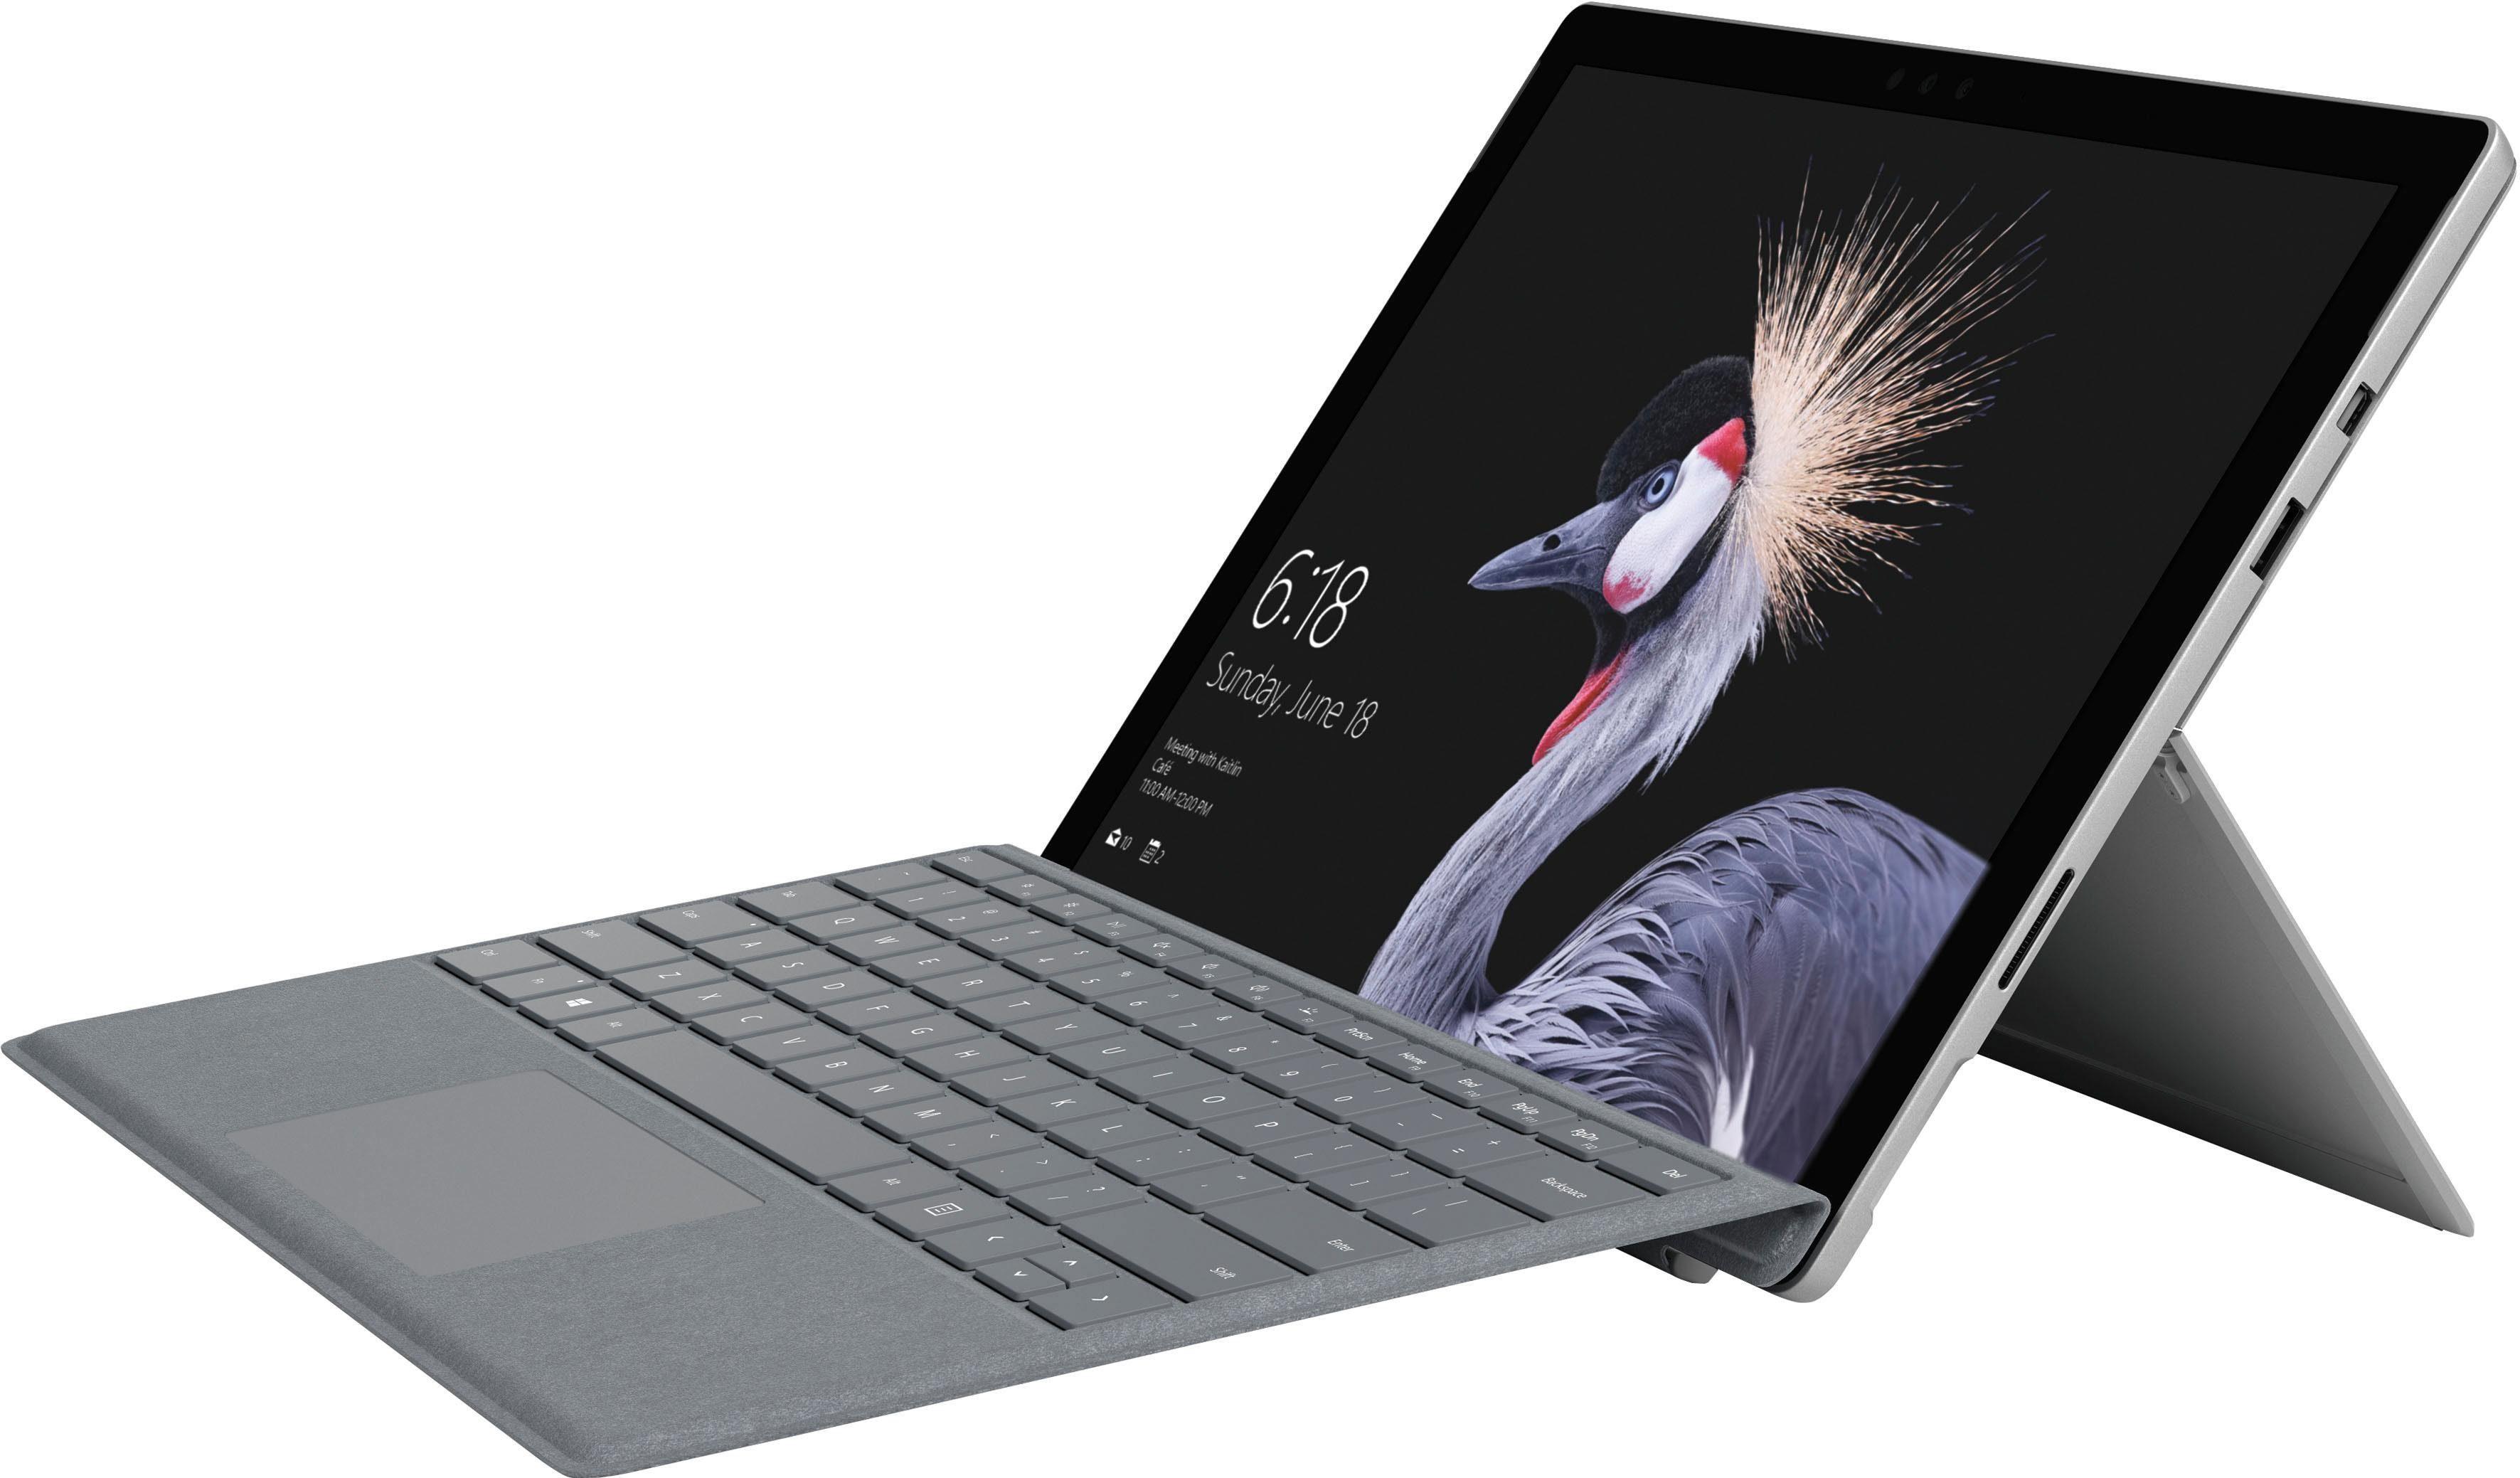 Microsoft Surface Notebook (Intel Intel, HD Graphics 620, 128 GB SSD)